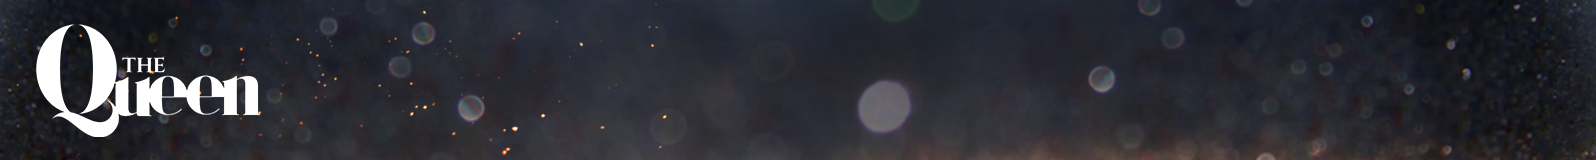 36 slim billboard desktop 1600x160 019 pre